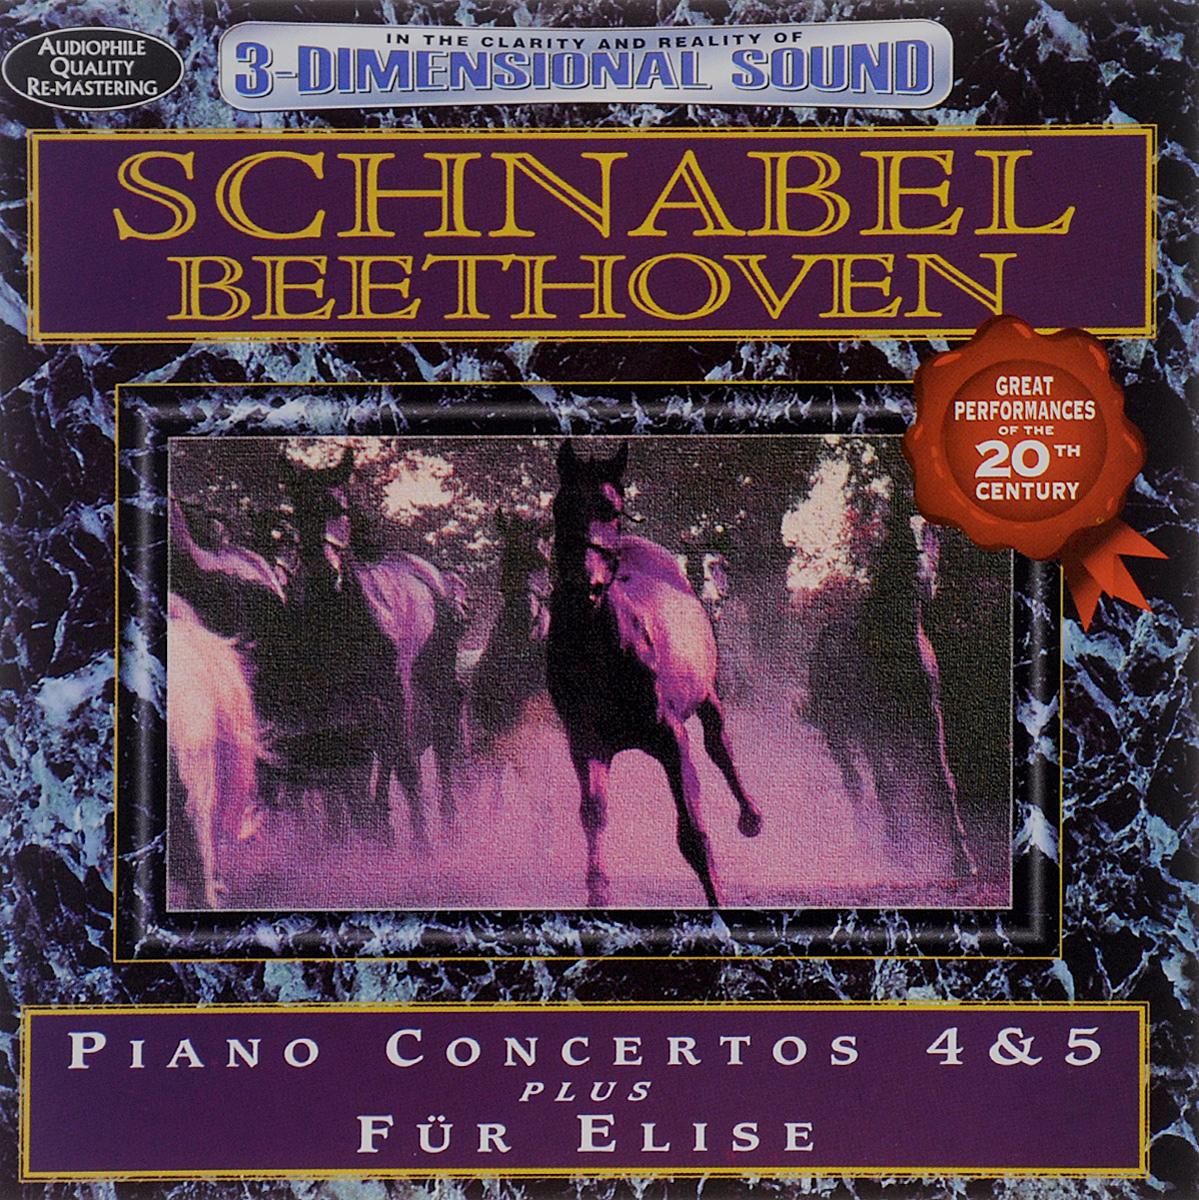 Артур Шнабель Avid Master Series. Artur Schnabel. Beethoven. Piano Concertos 4 & 5 / Fur Elise